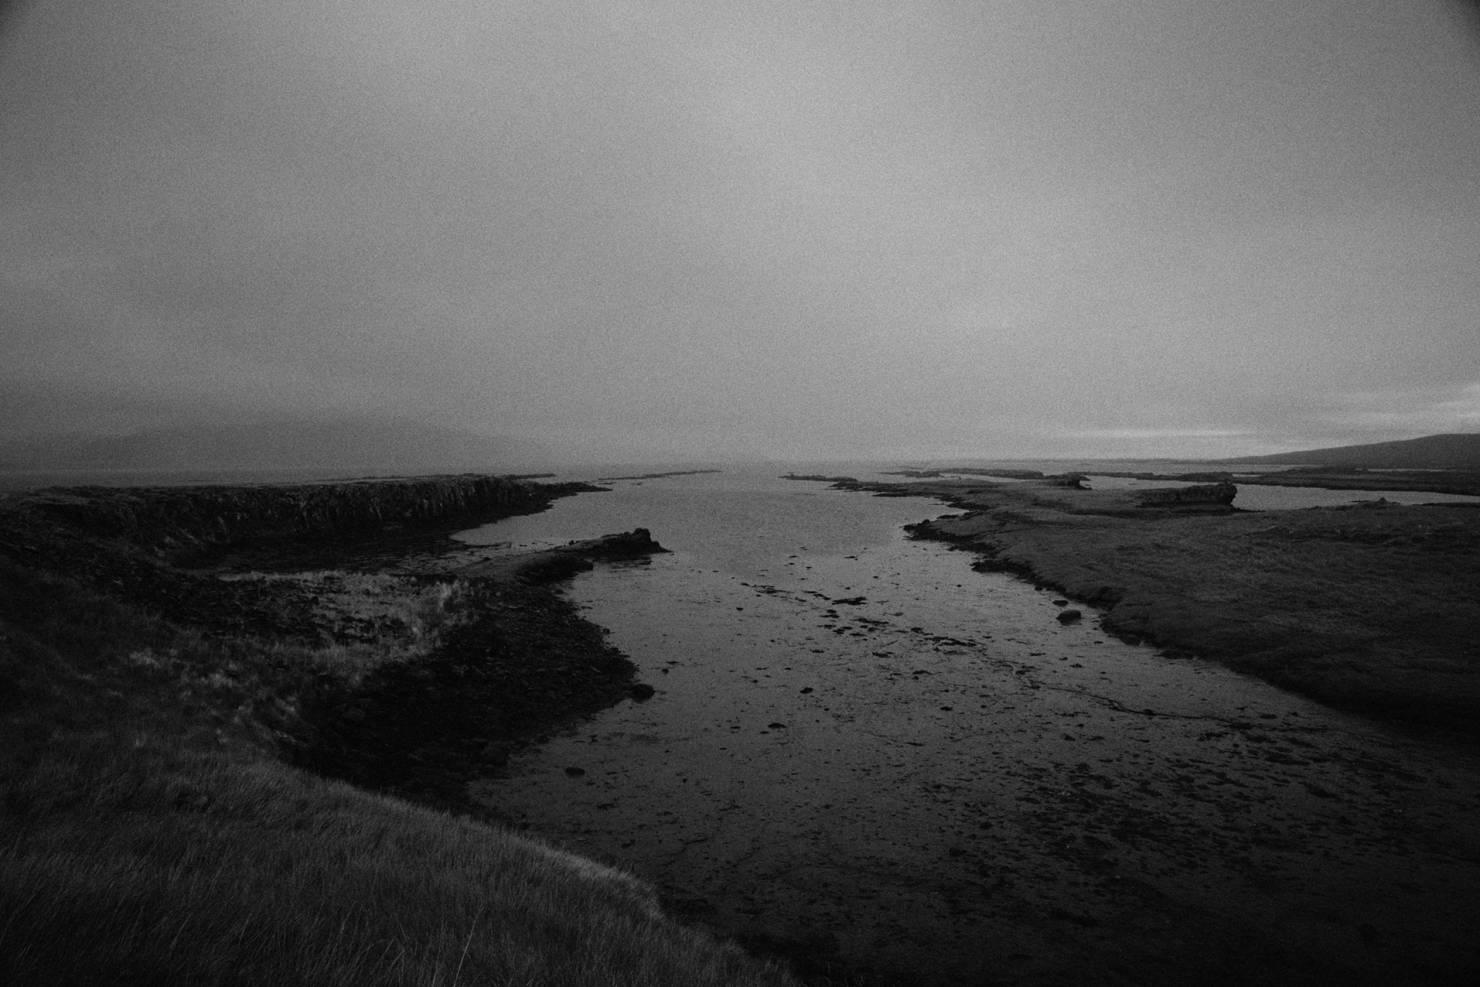 patrick_schuttler_landscape_iceland_009-e85be70297afba6a354e21eacdd47b87